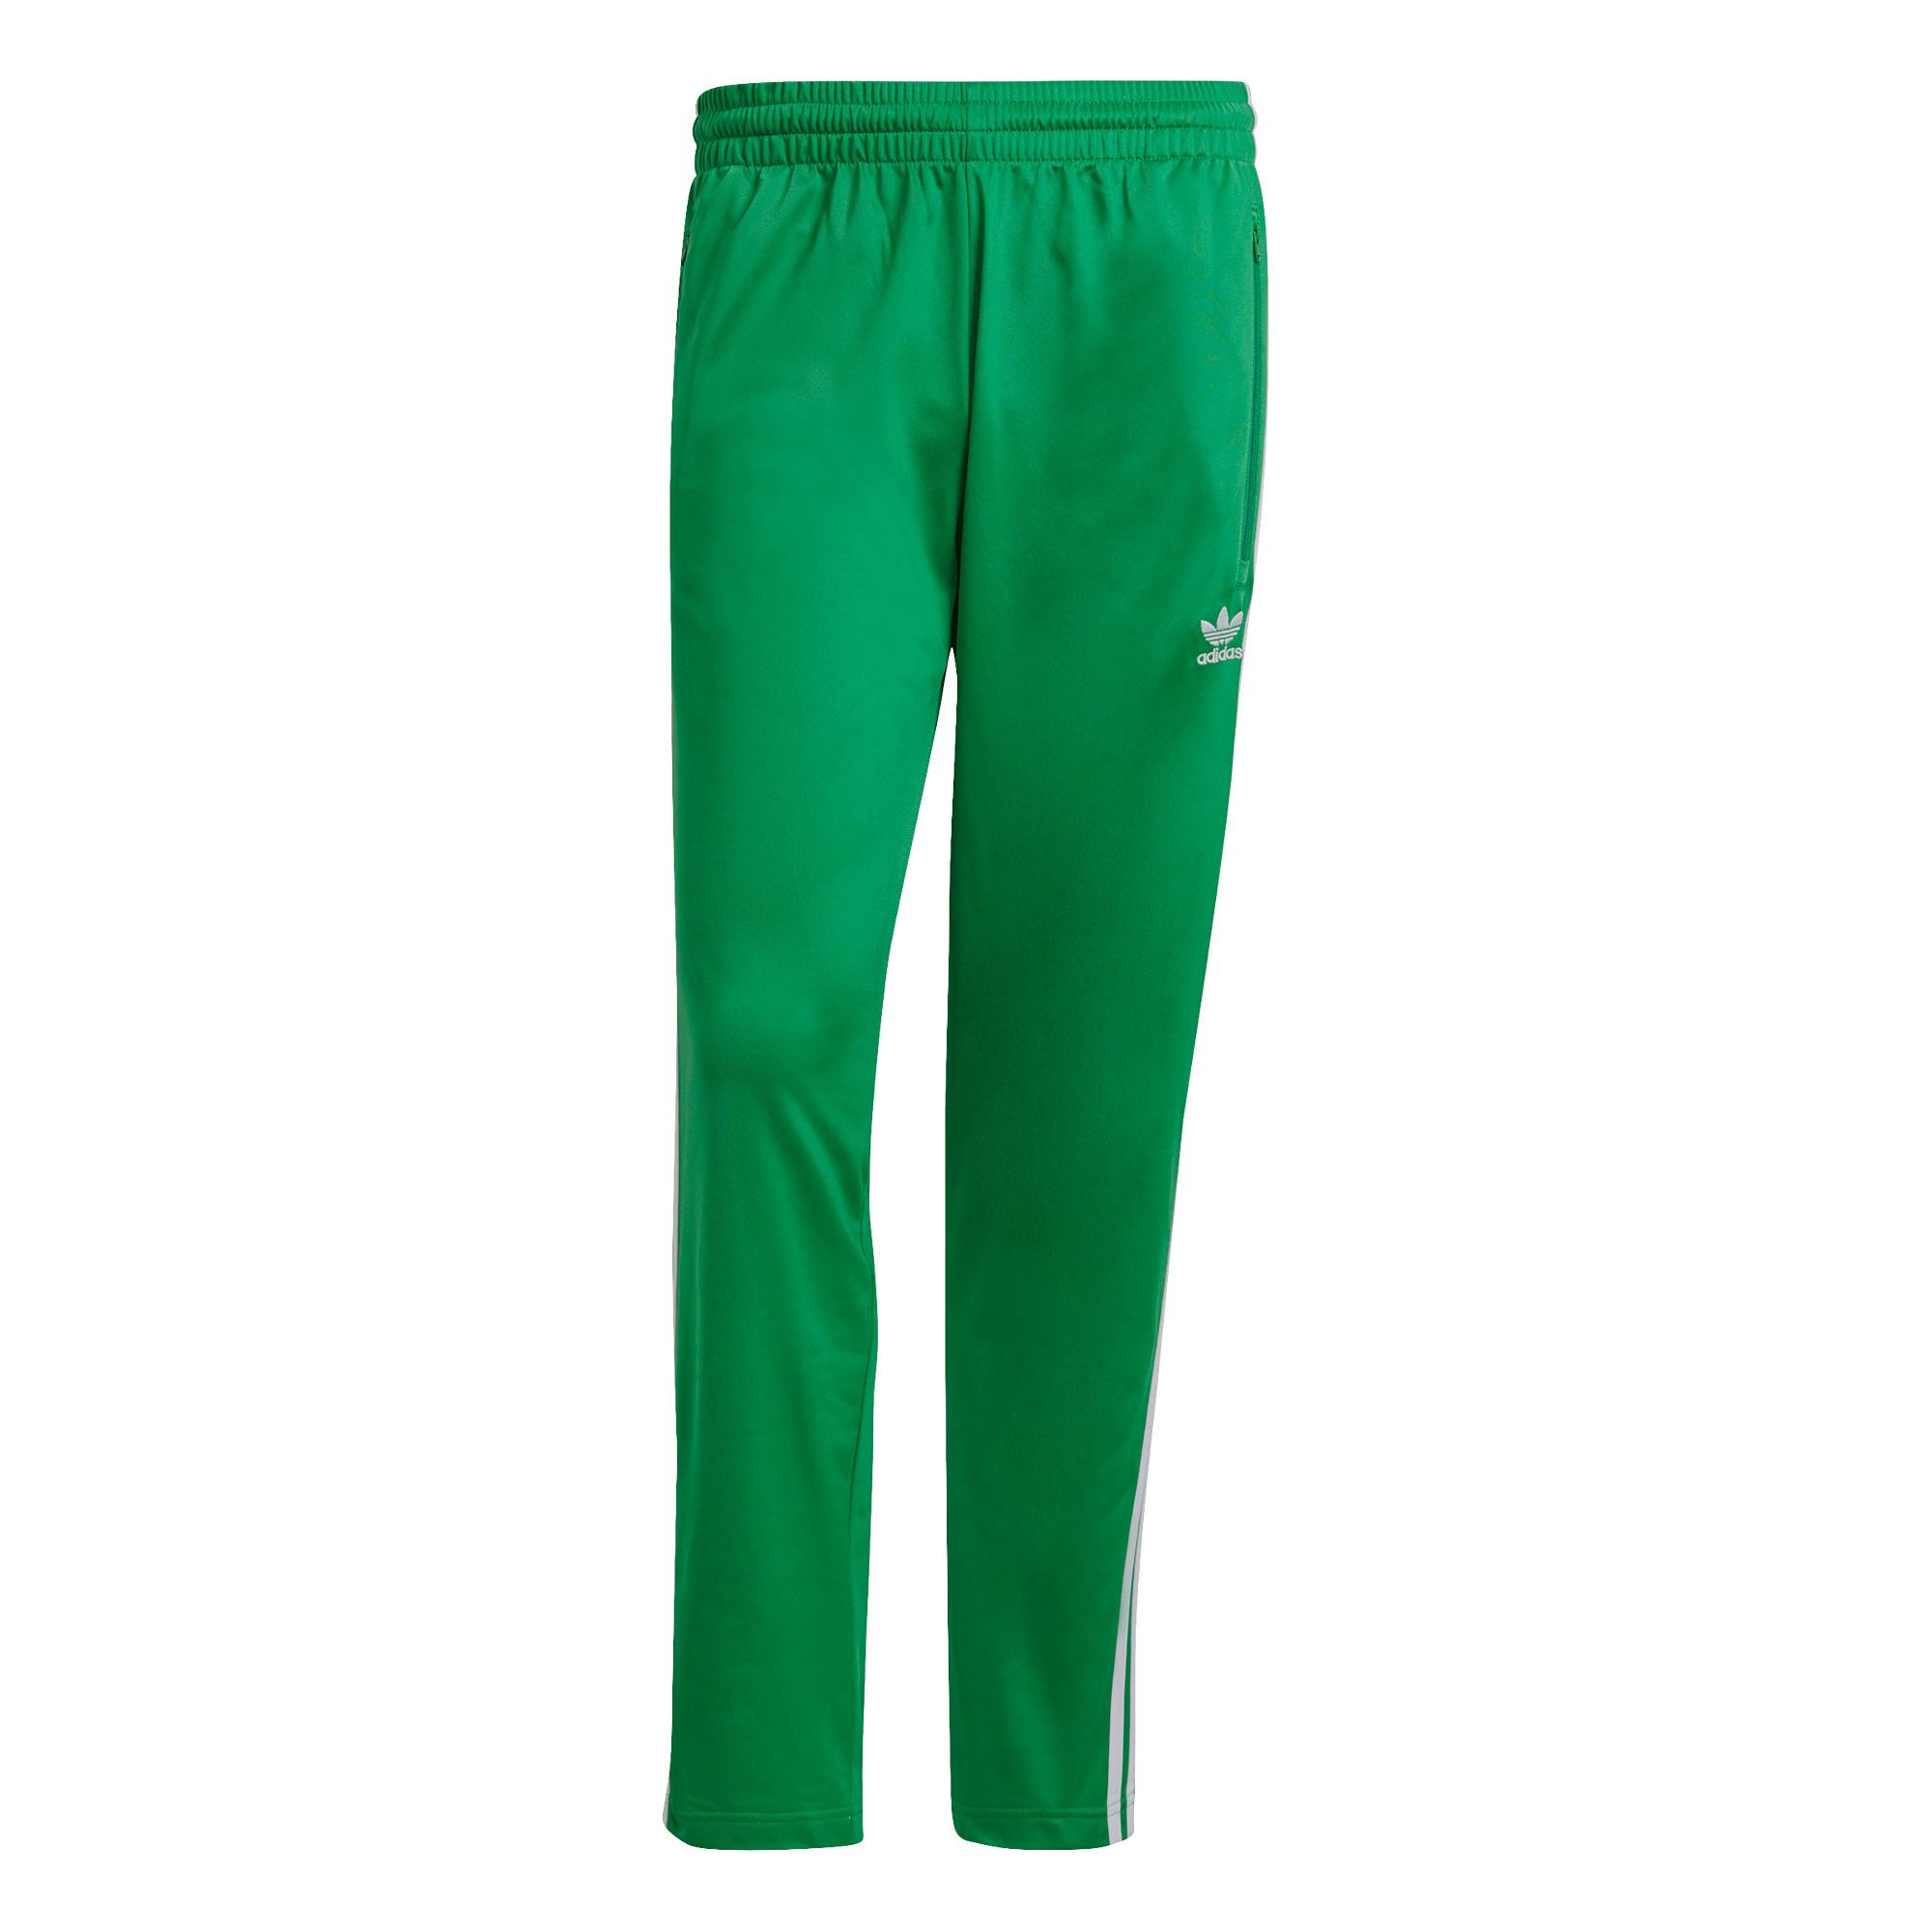 Pantaloni tuta adicolor classics, Verde, large image number 0